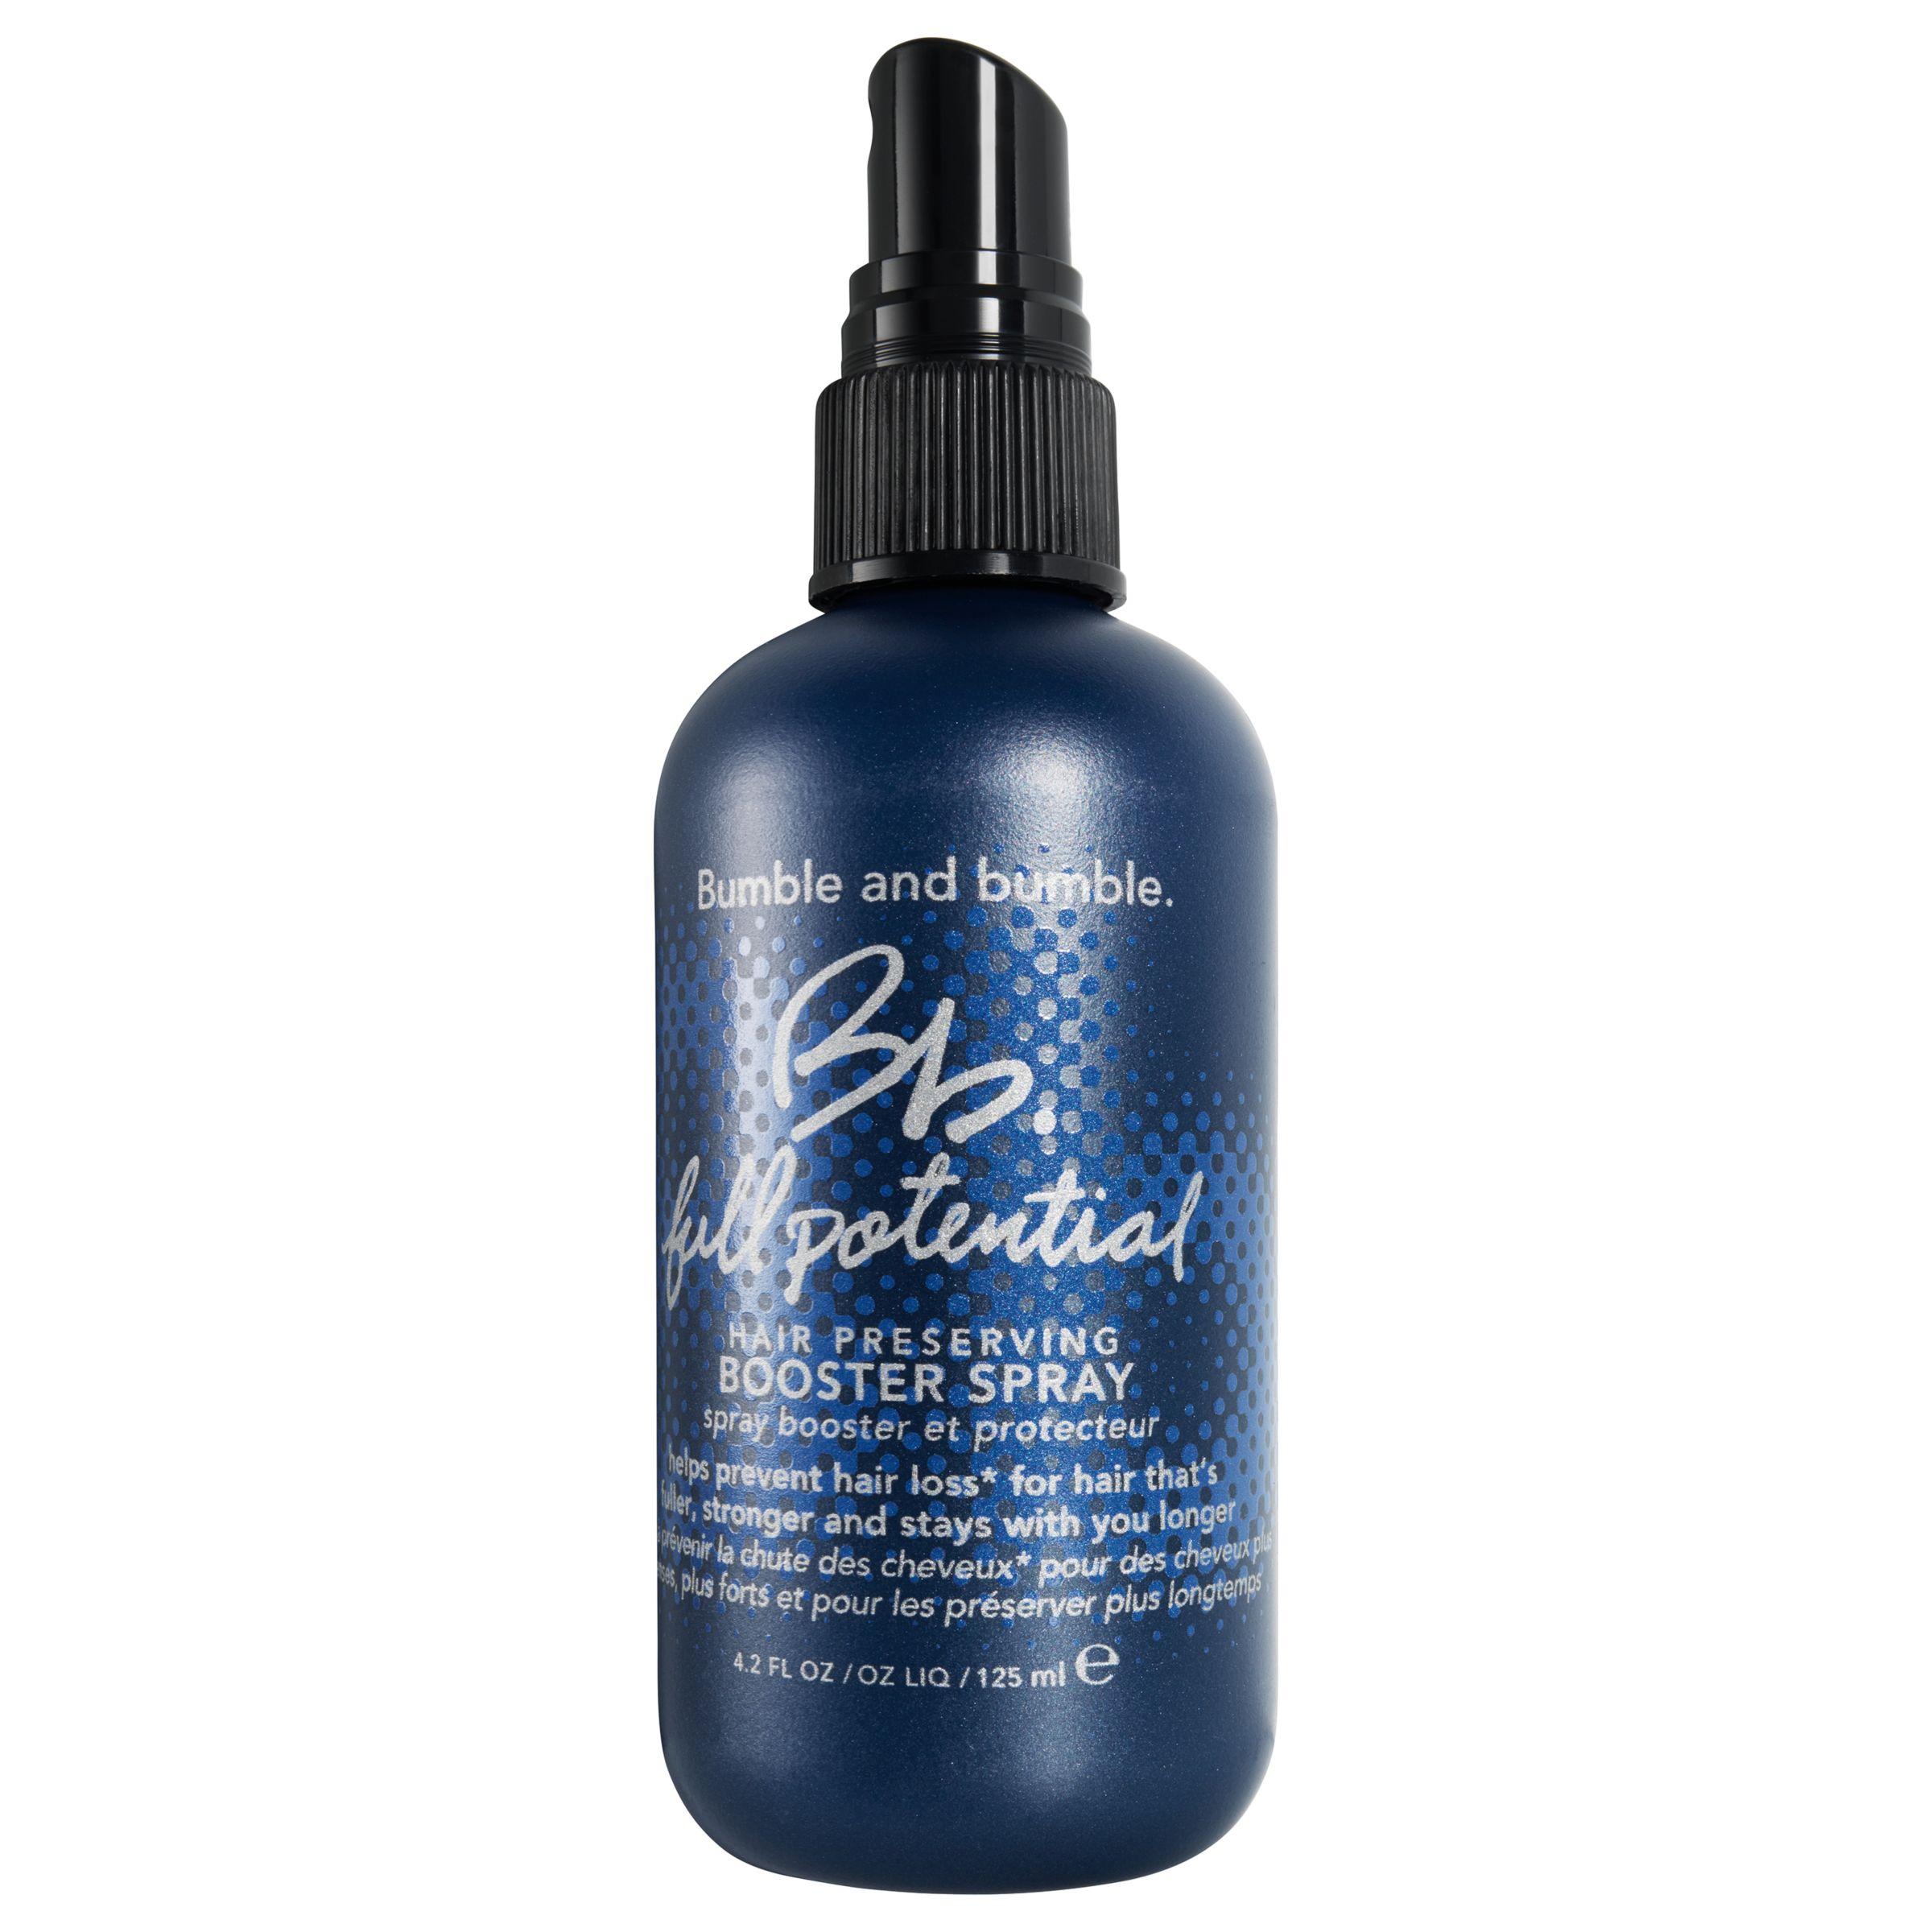 Bumble and bumble Bumble and bumble Full Potential Hair Preserving Booster Spray, 125ml